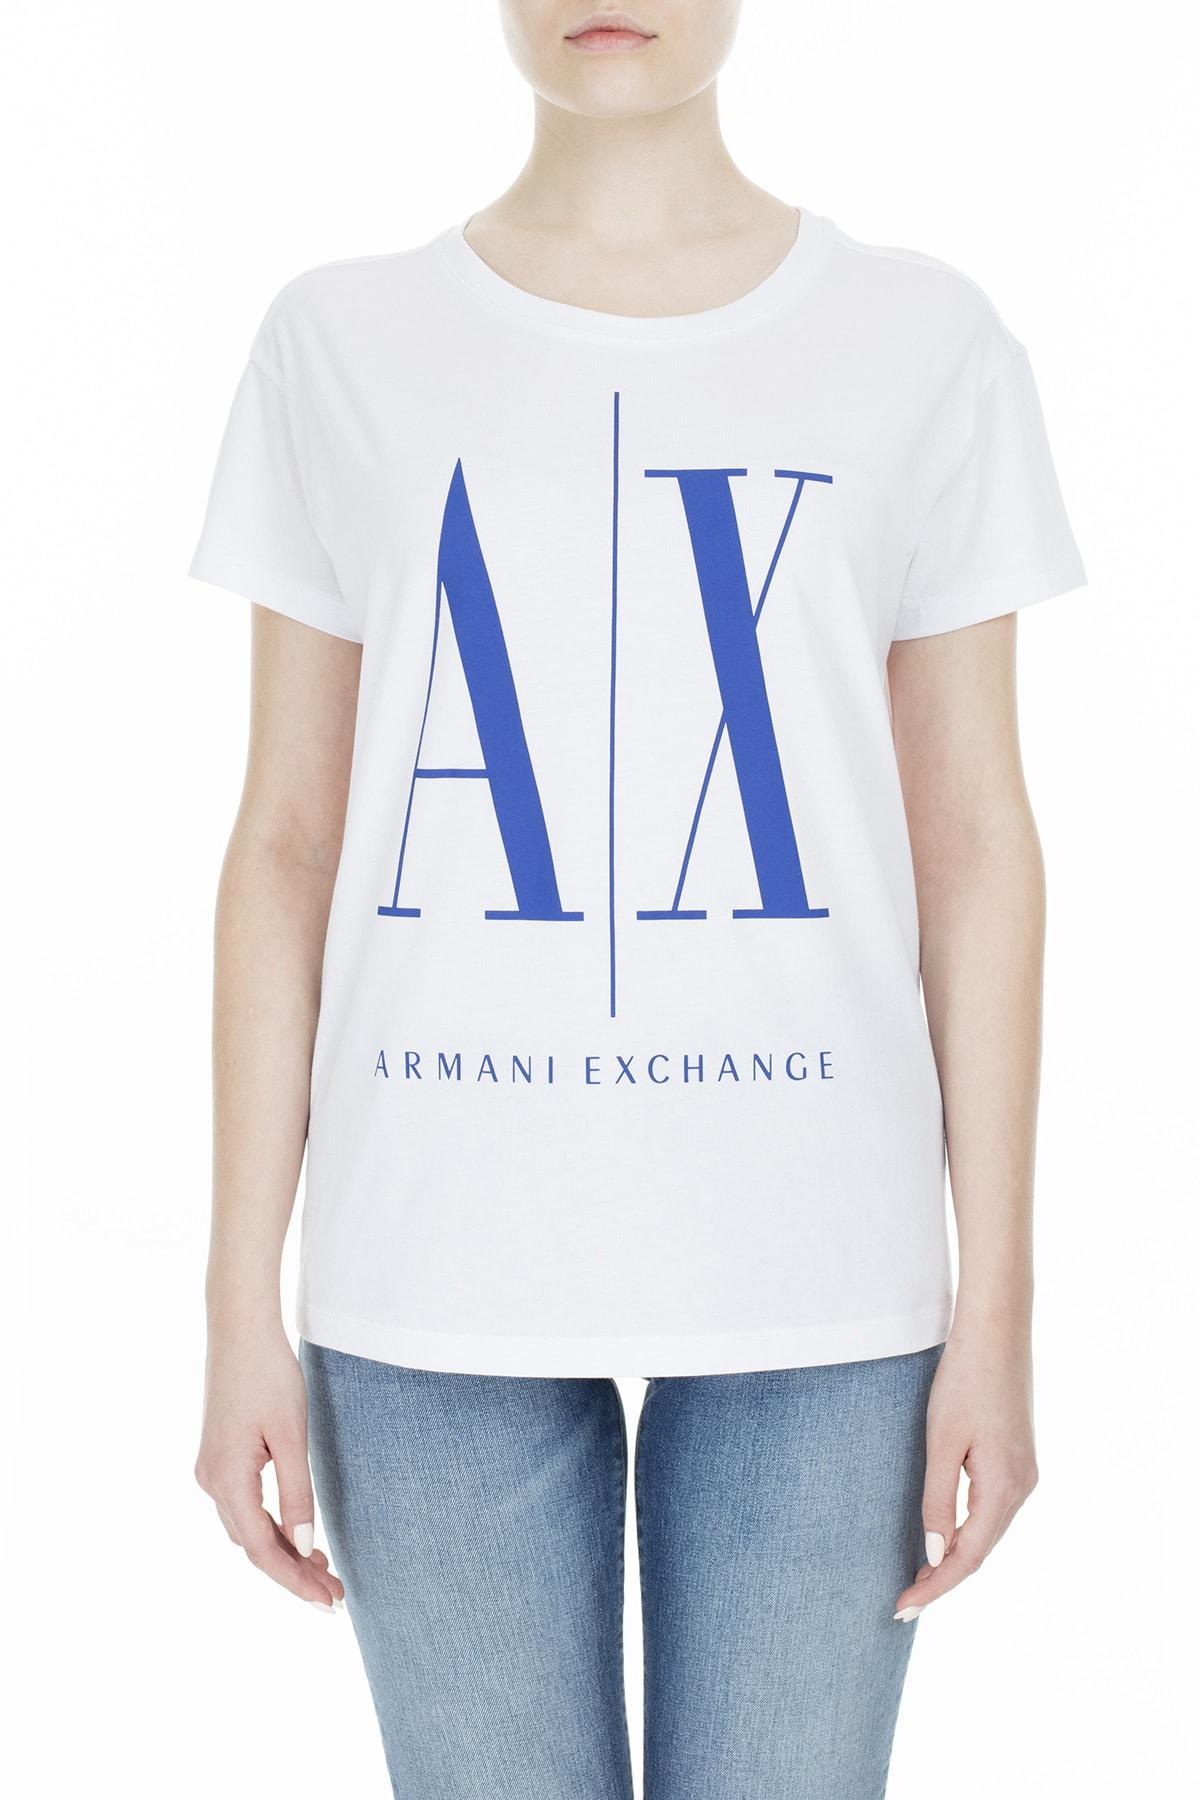 Armani T Shirt Kadın T Shirt 8Nytcx Yjg3Z 7141